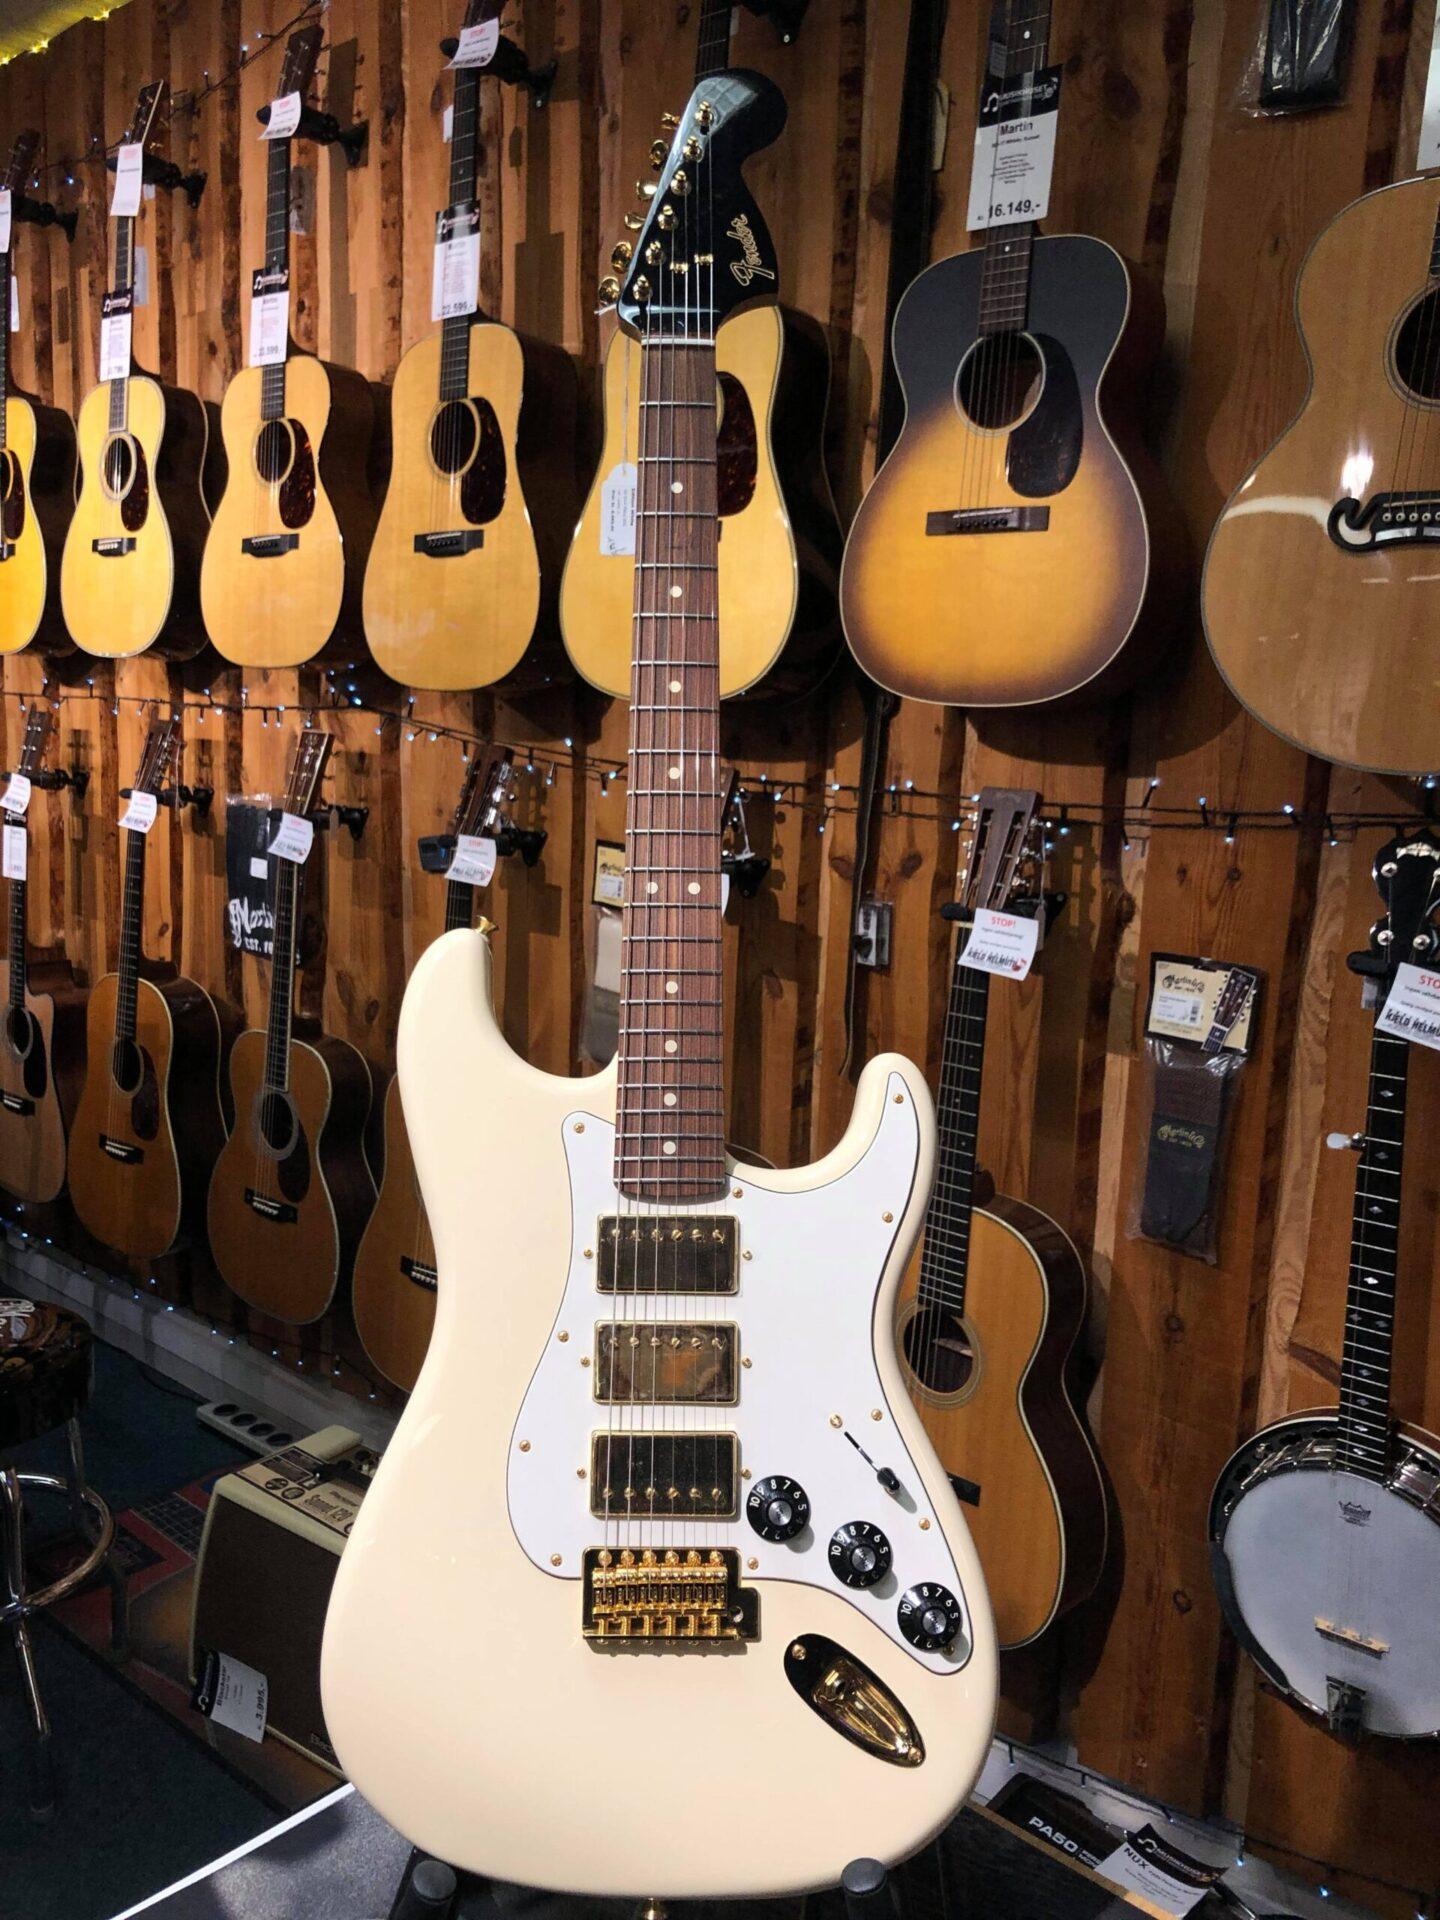 Fender Strat Limited Edition